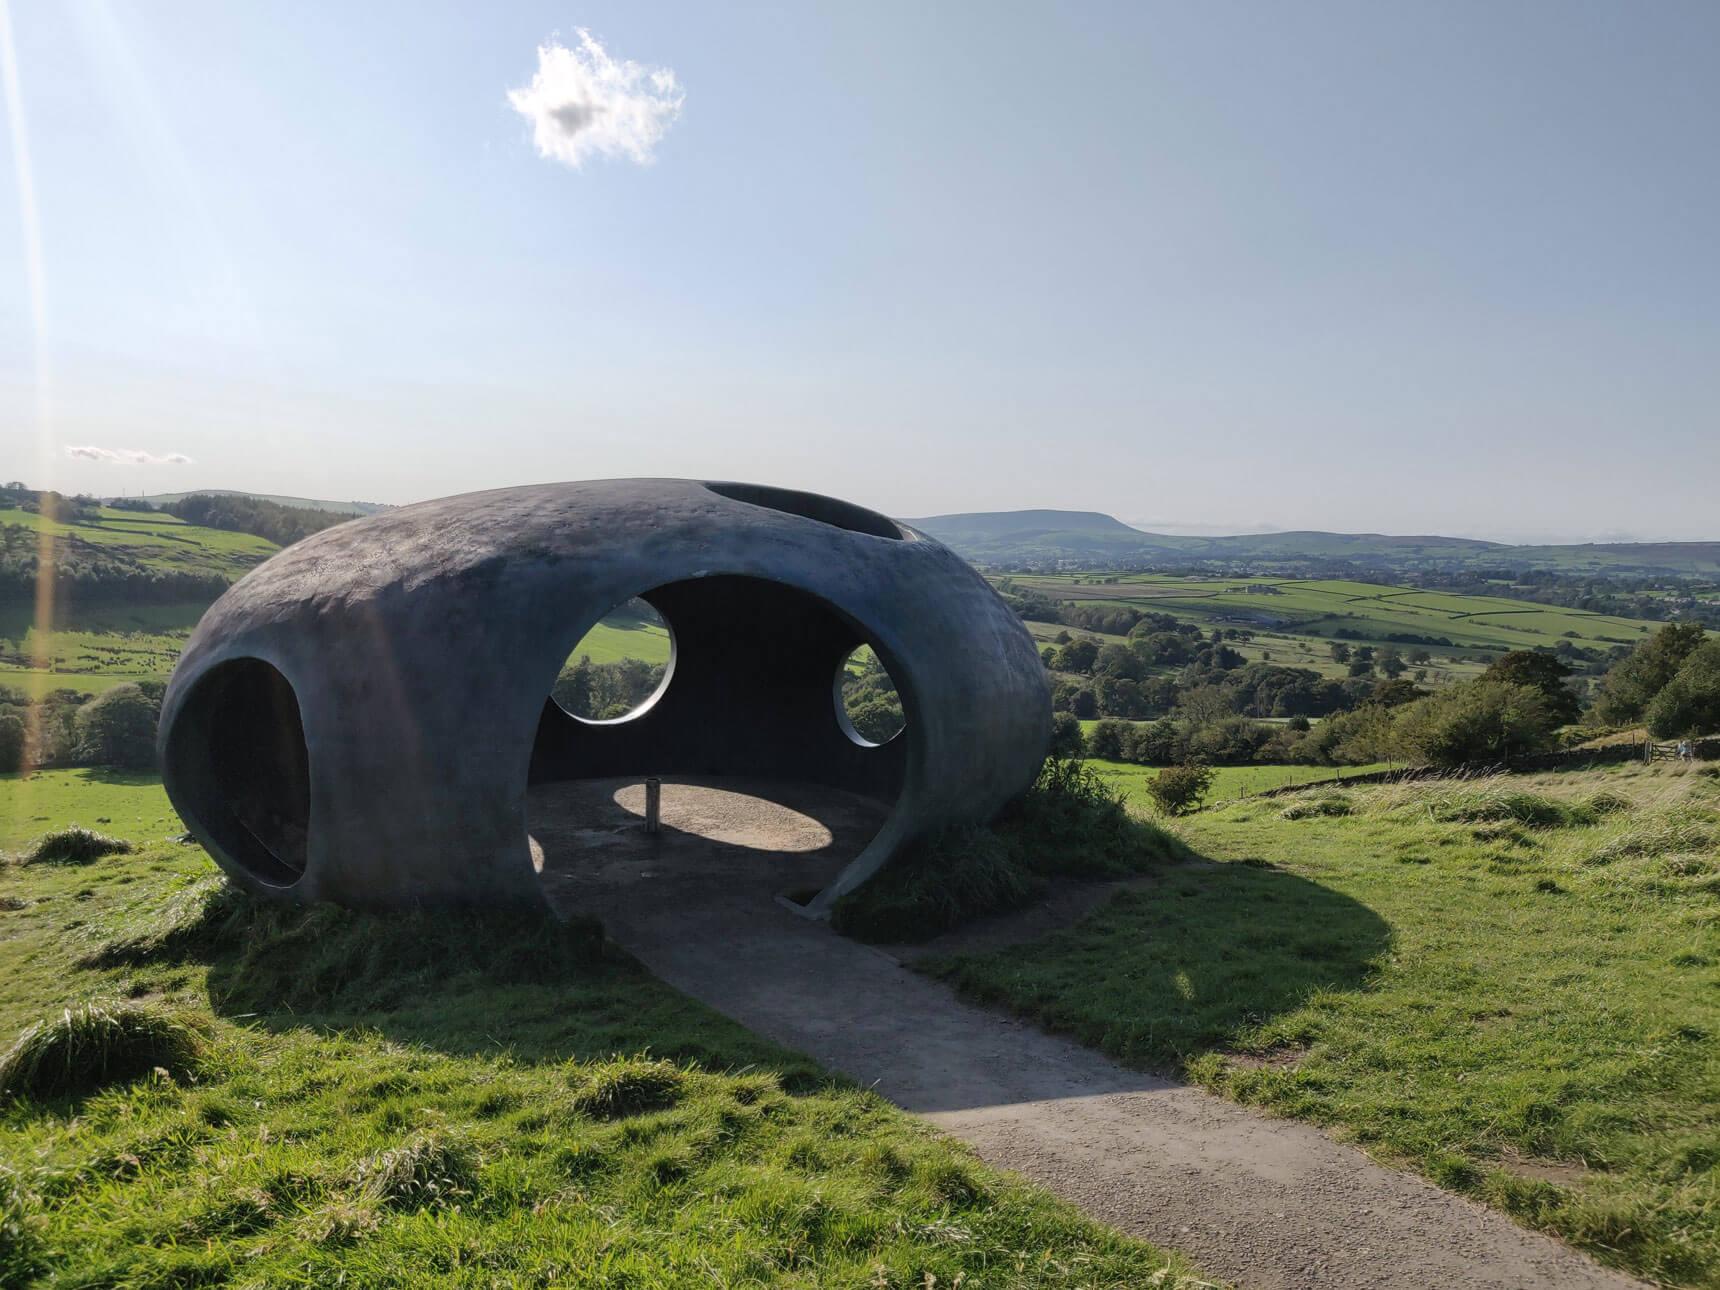 The Atom Panopticon near Colne in East Lancashire